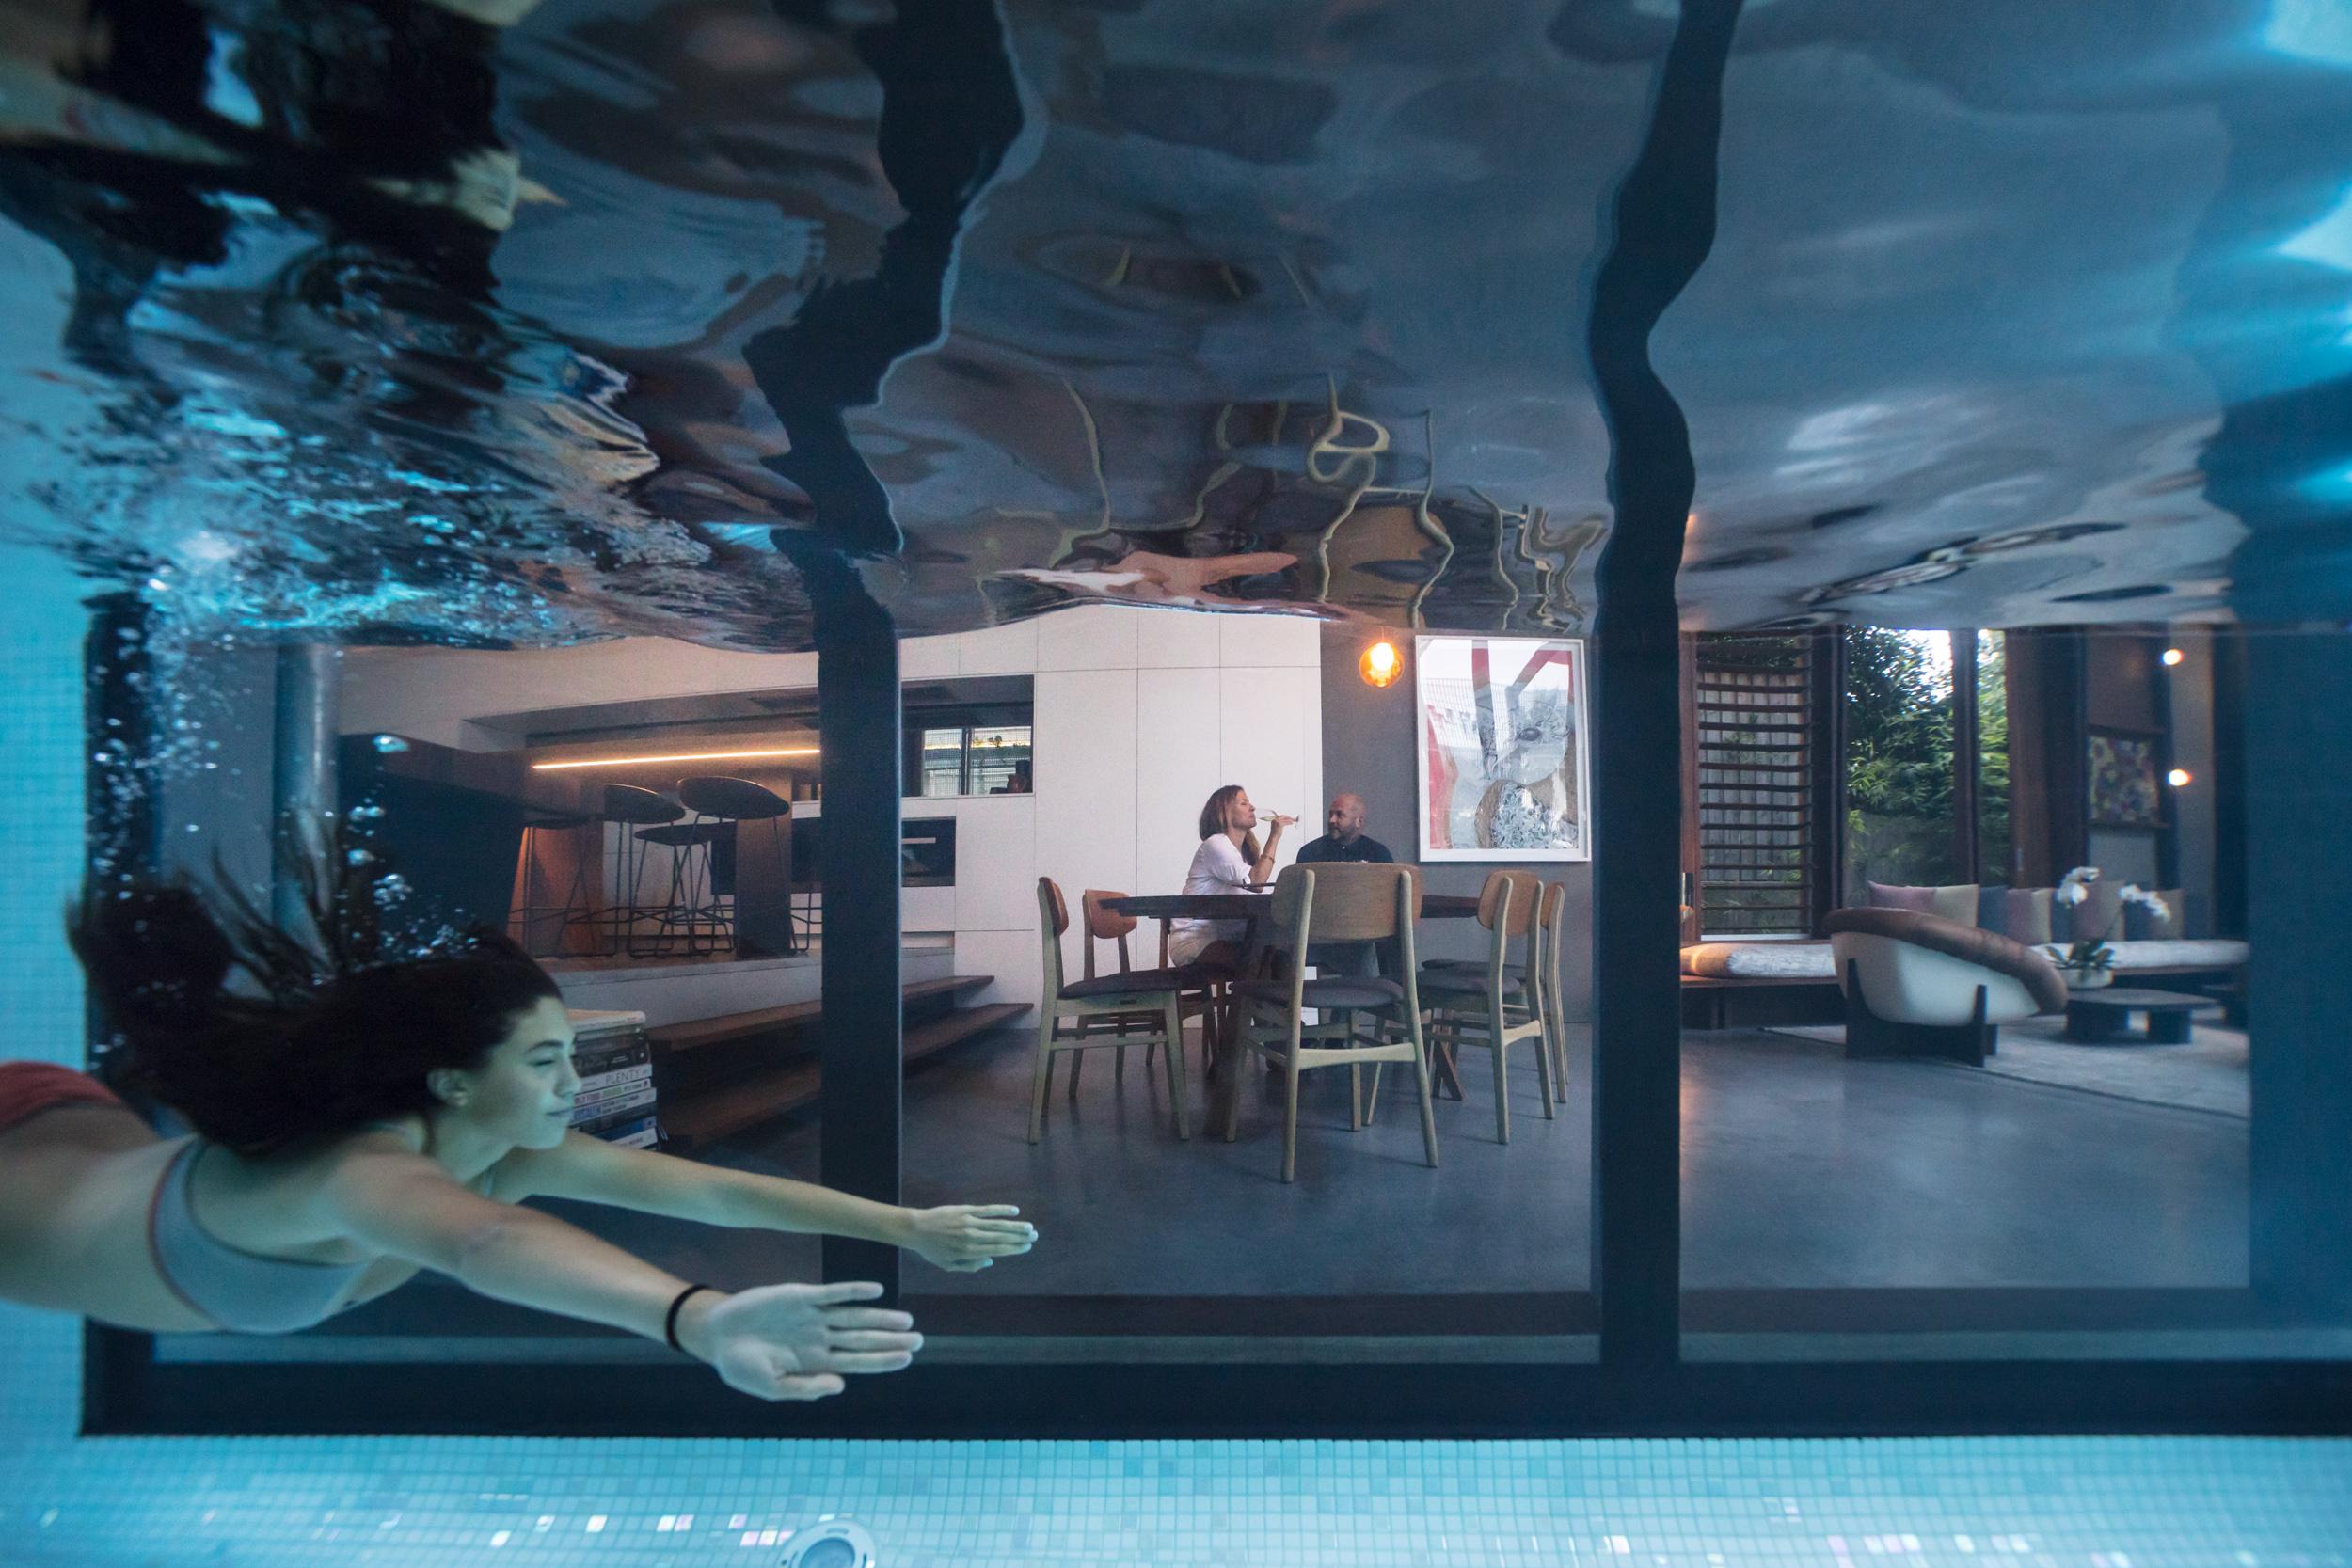 Jem_Cresswell_Architecture_Residential_Photographer_Sydney_Australia_047.jpg